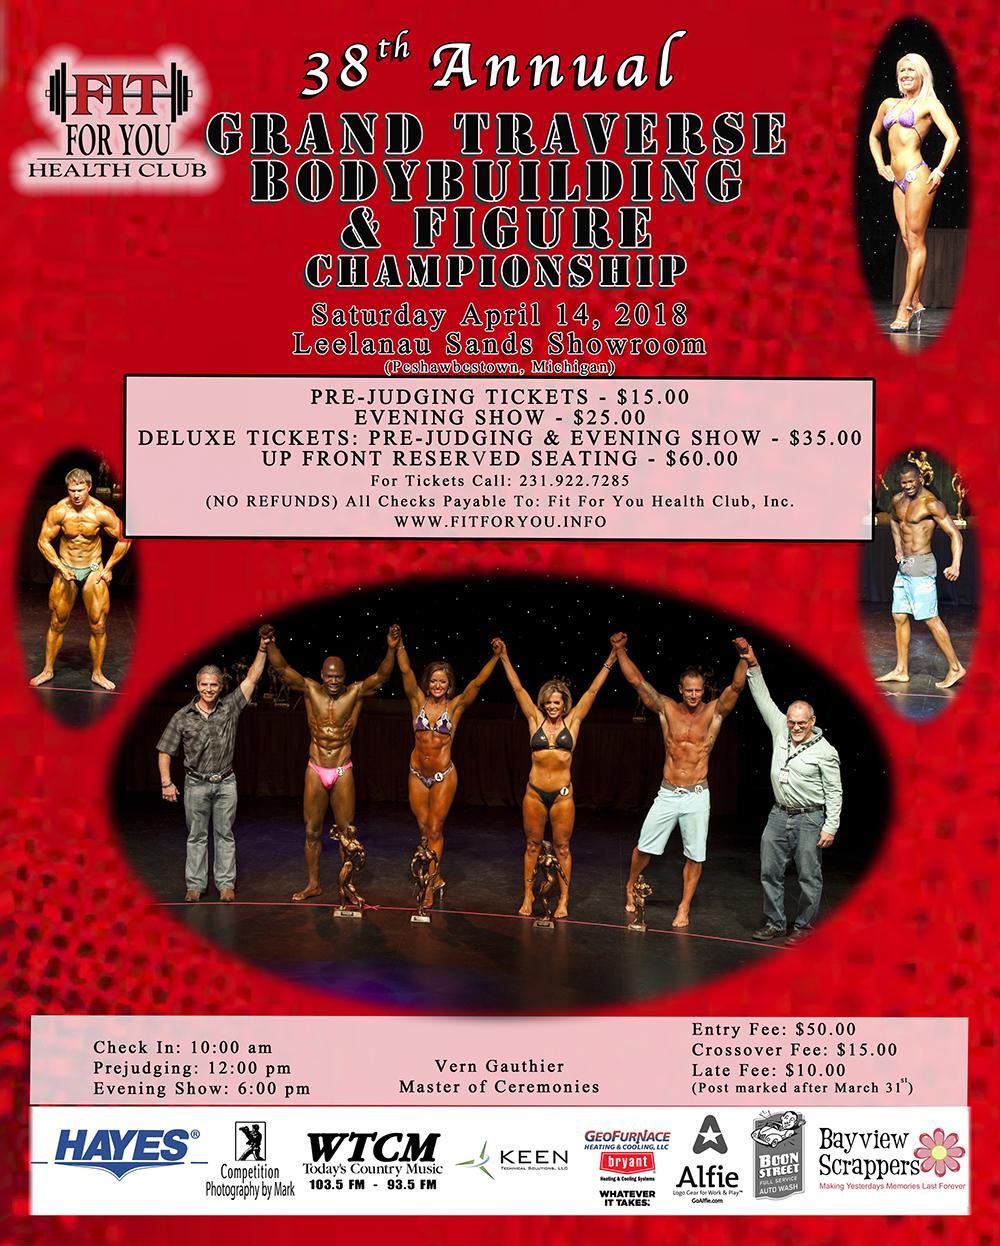 Grand Traverse Bodybuilding & Figure Championship